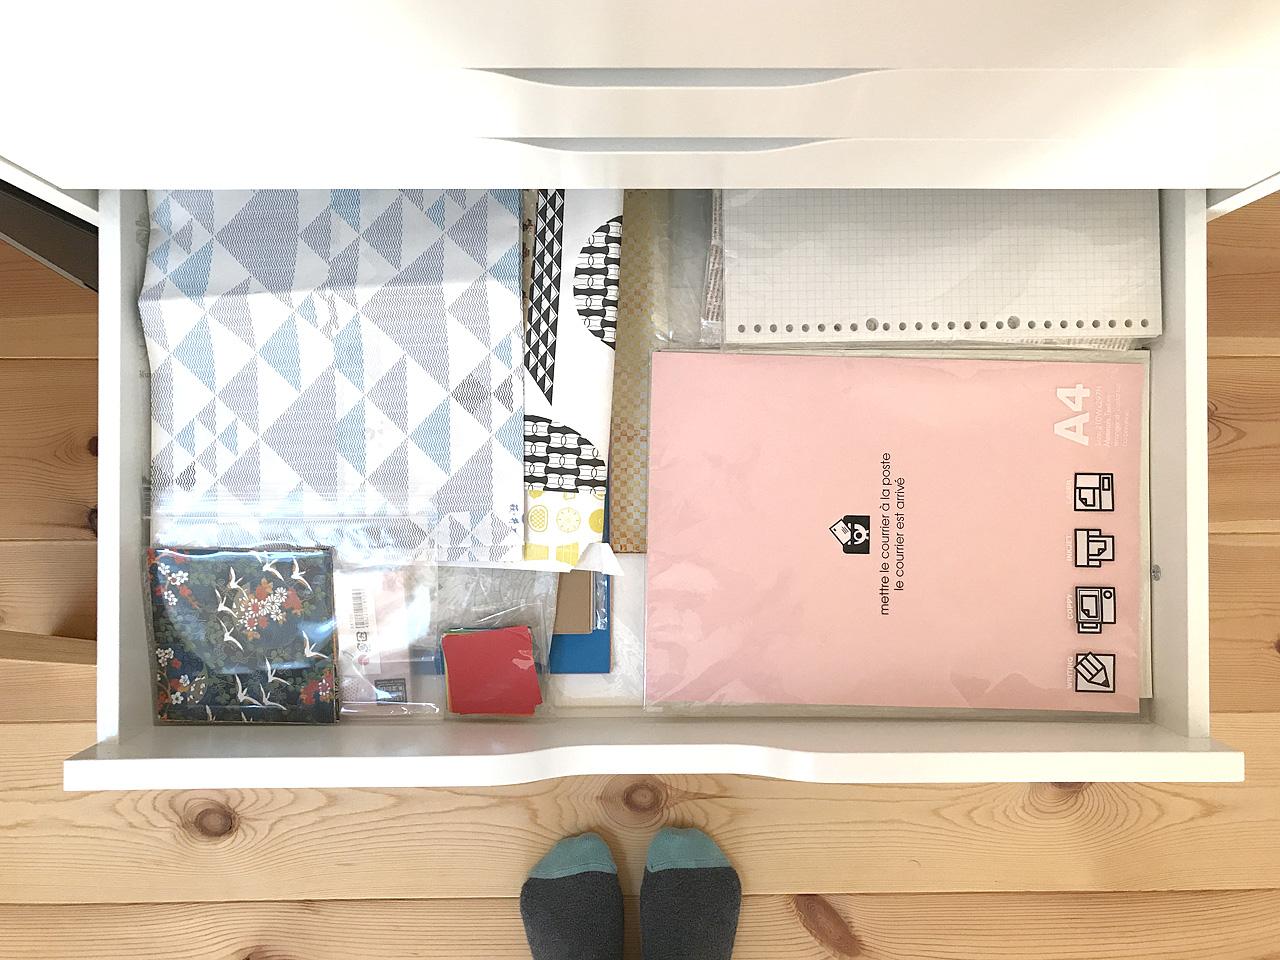 IKEAのALEX引き出しユニット